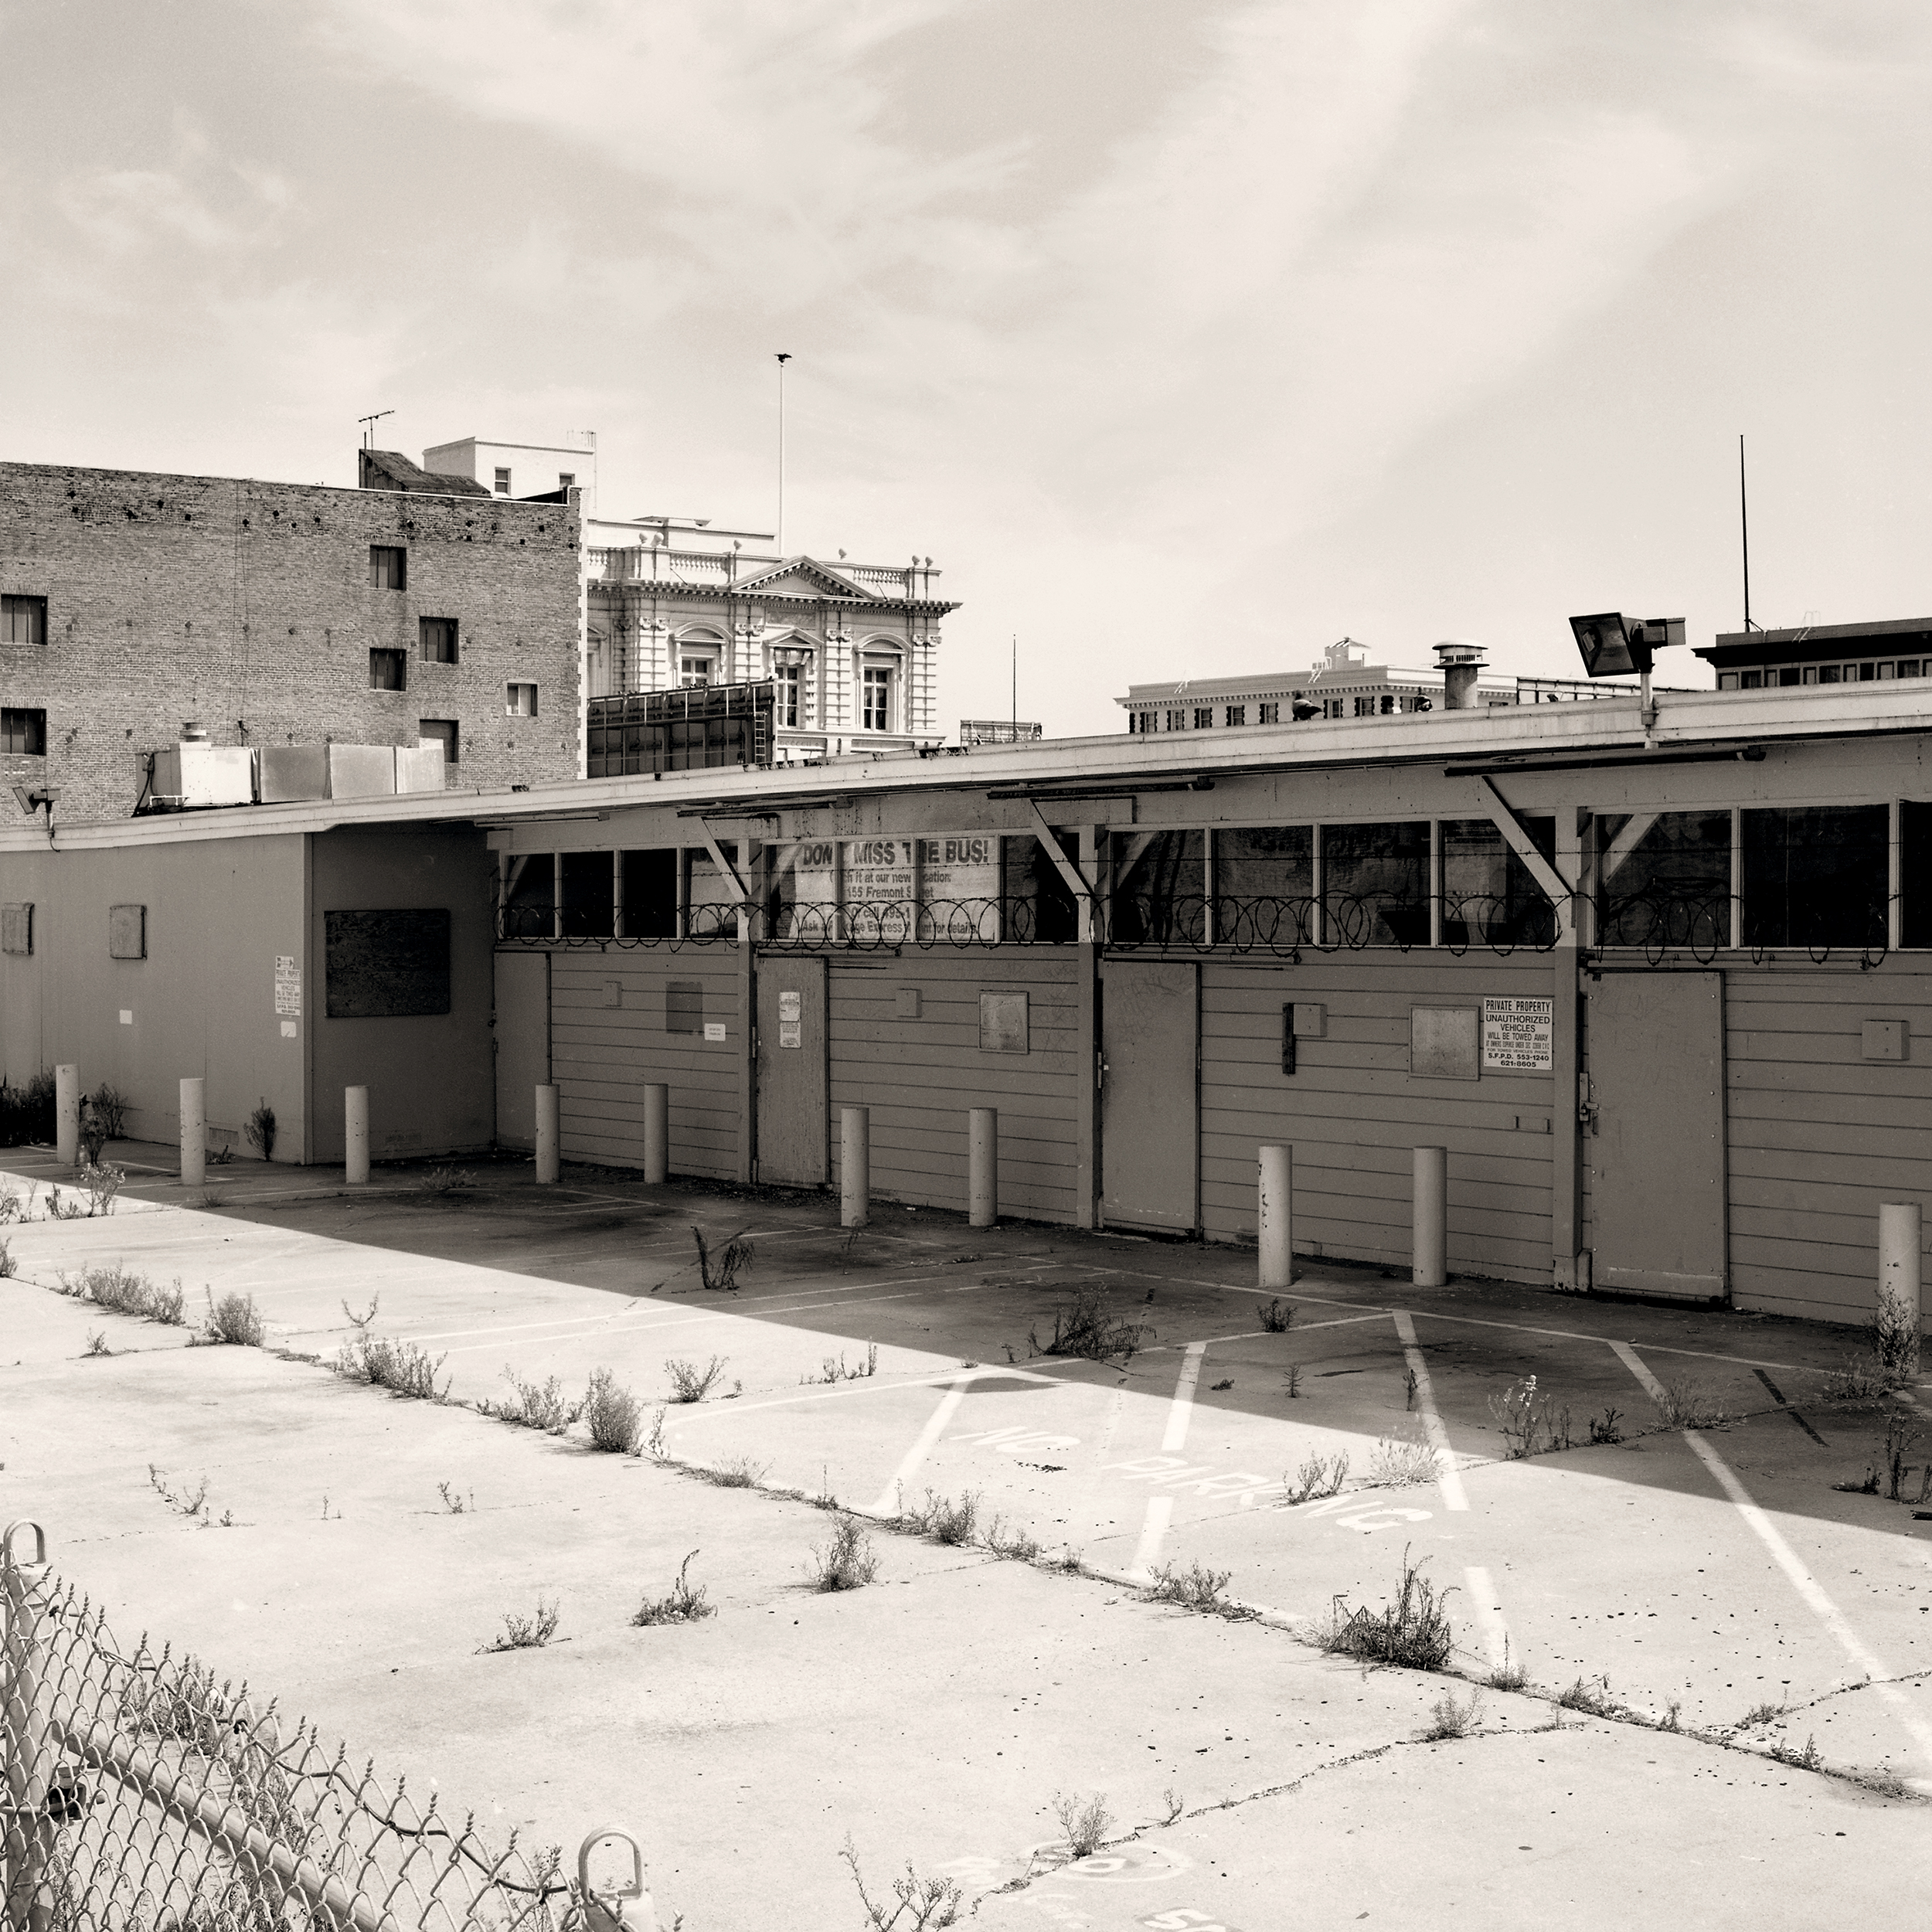 Greyhound Station, San Francisco